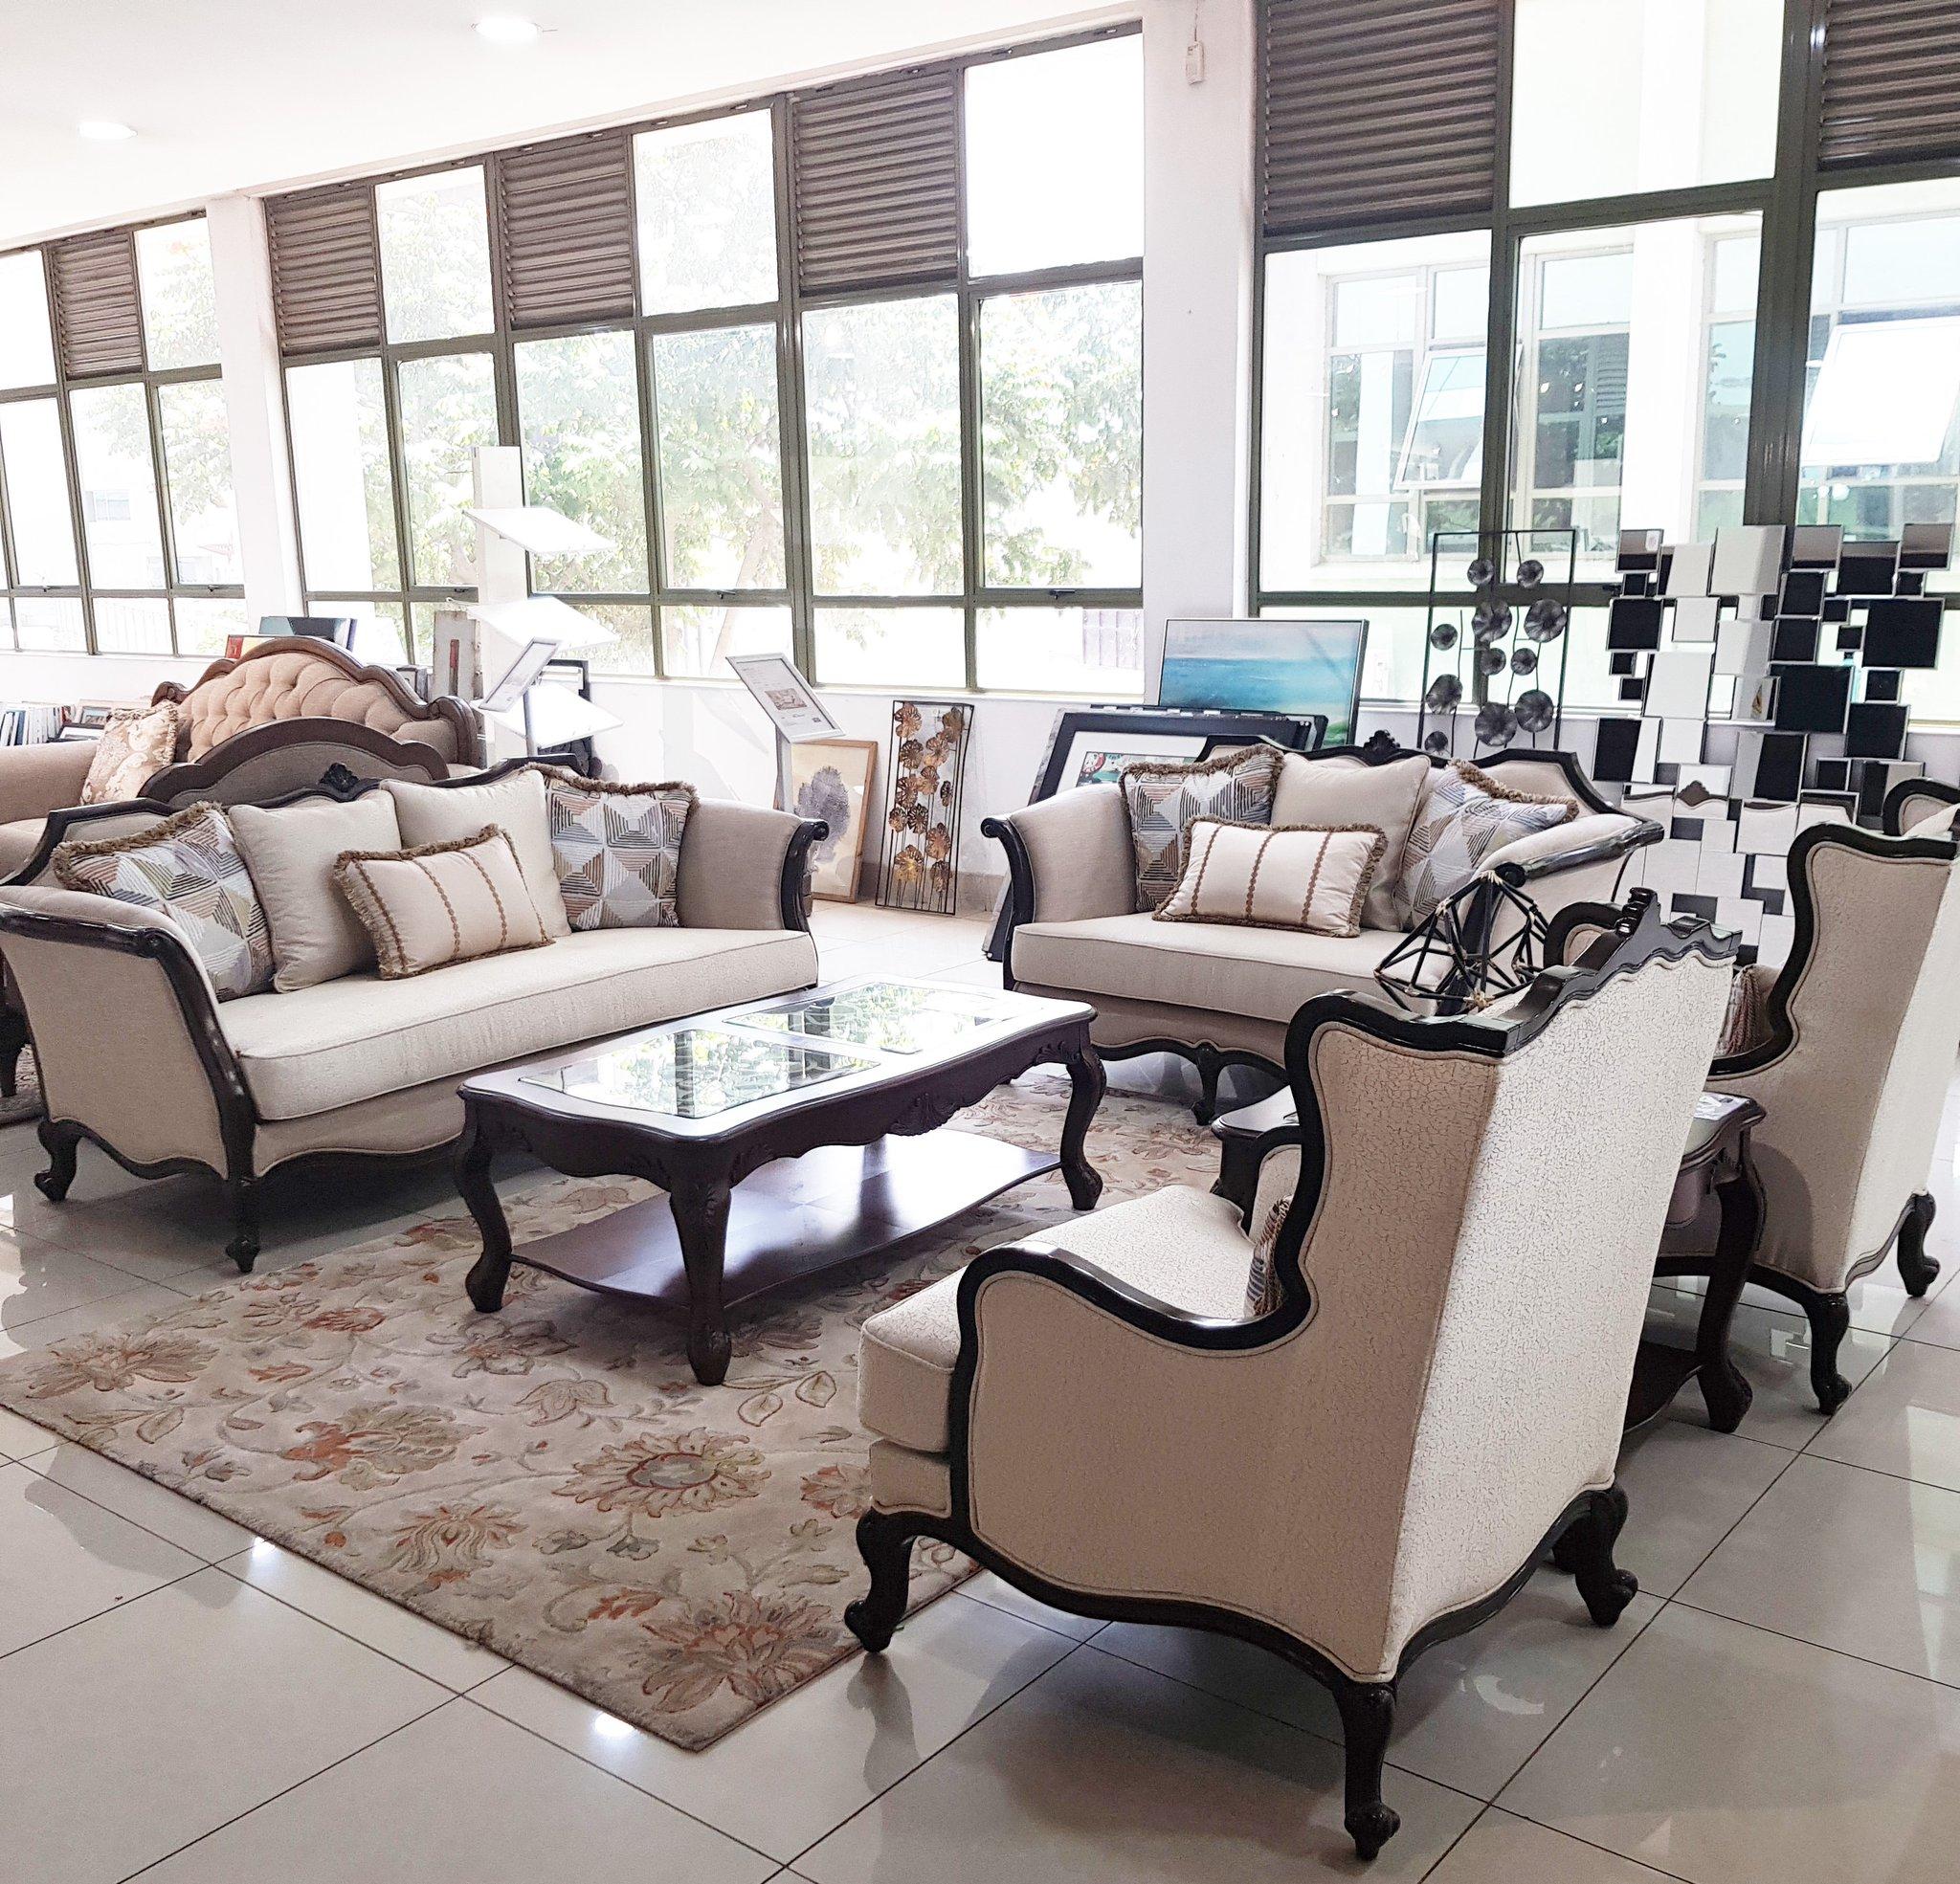 "Furniture Palace Ltd on Twitter: ""All about deals deals deals"